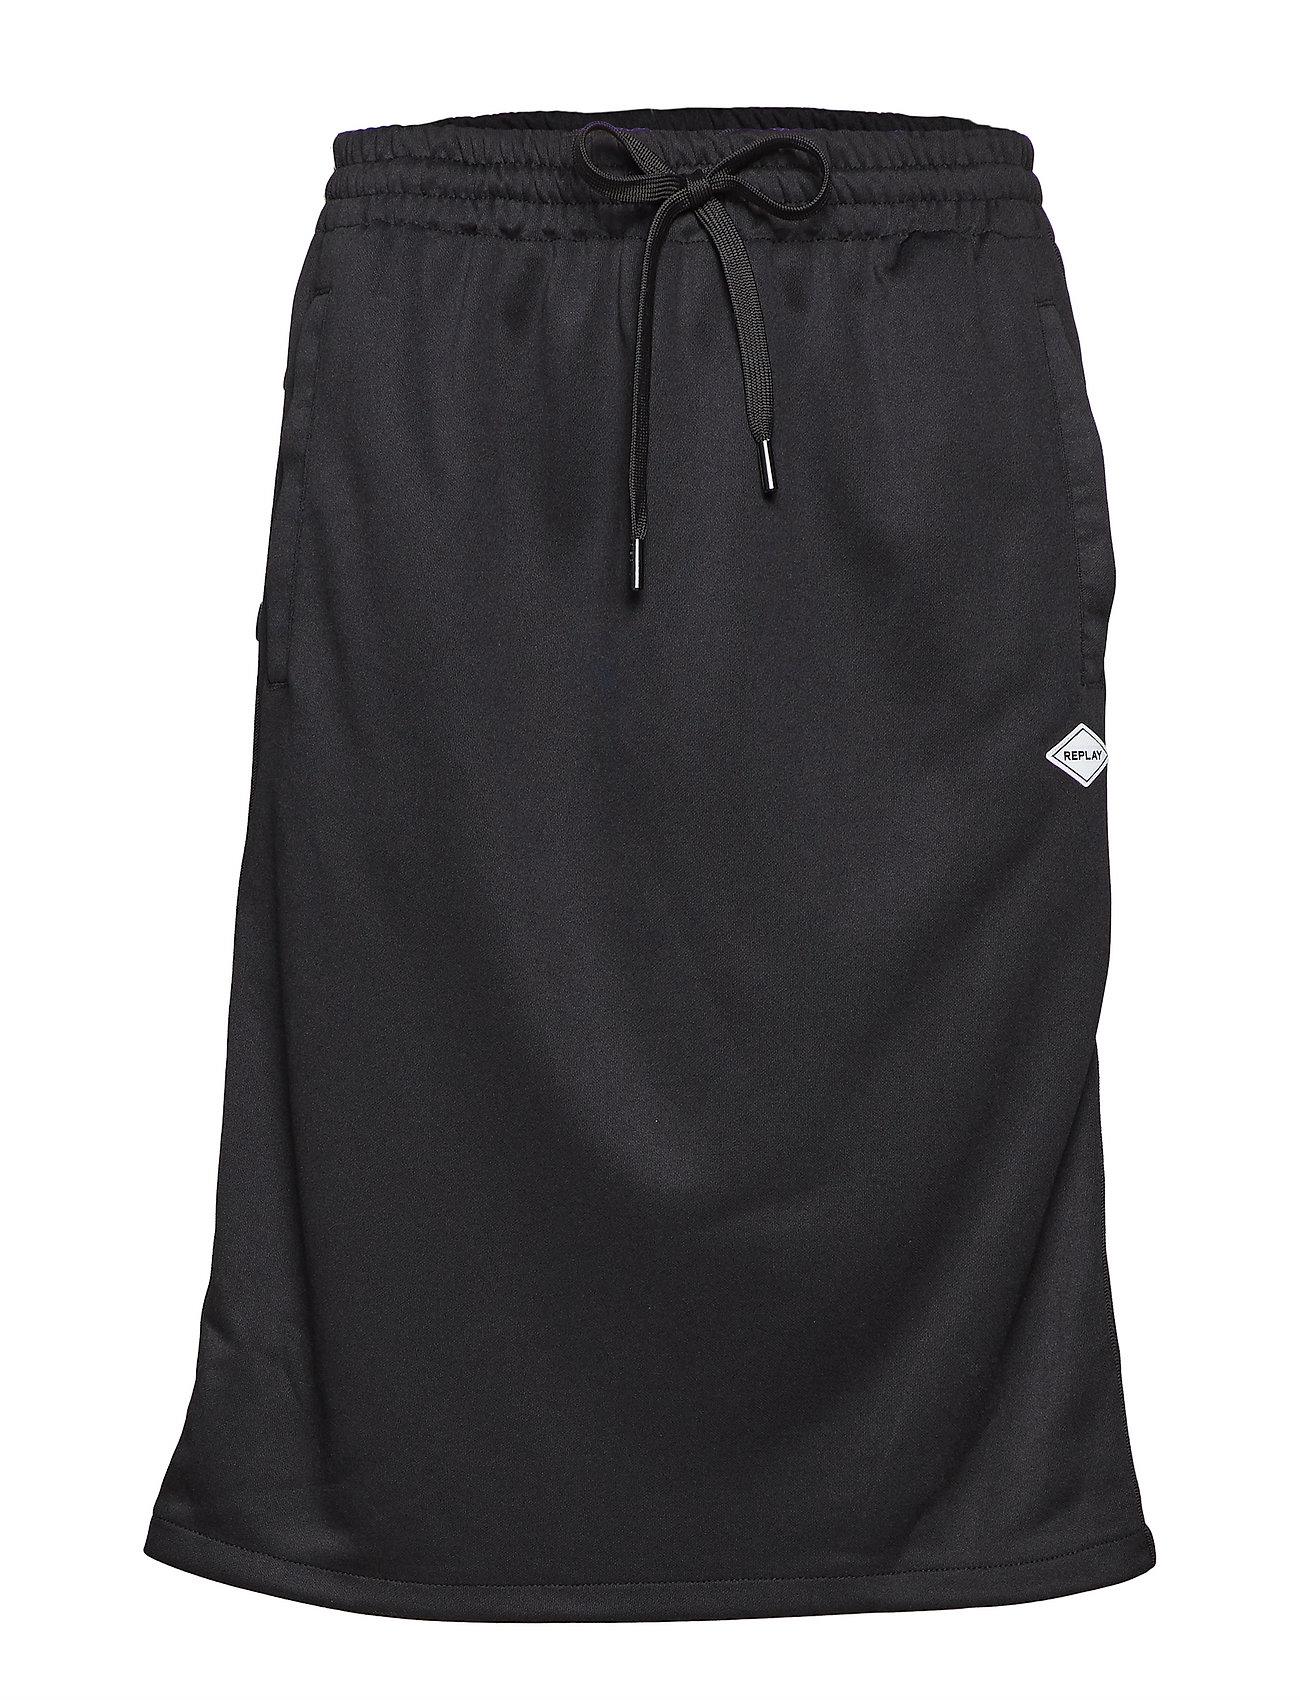 Replay Skirt - BLACK